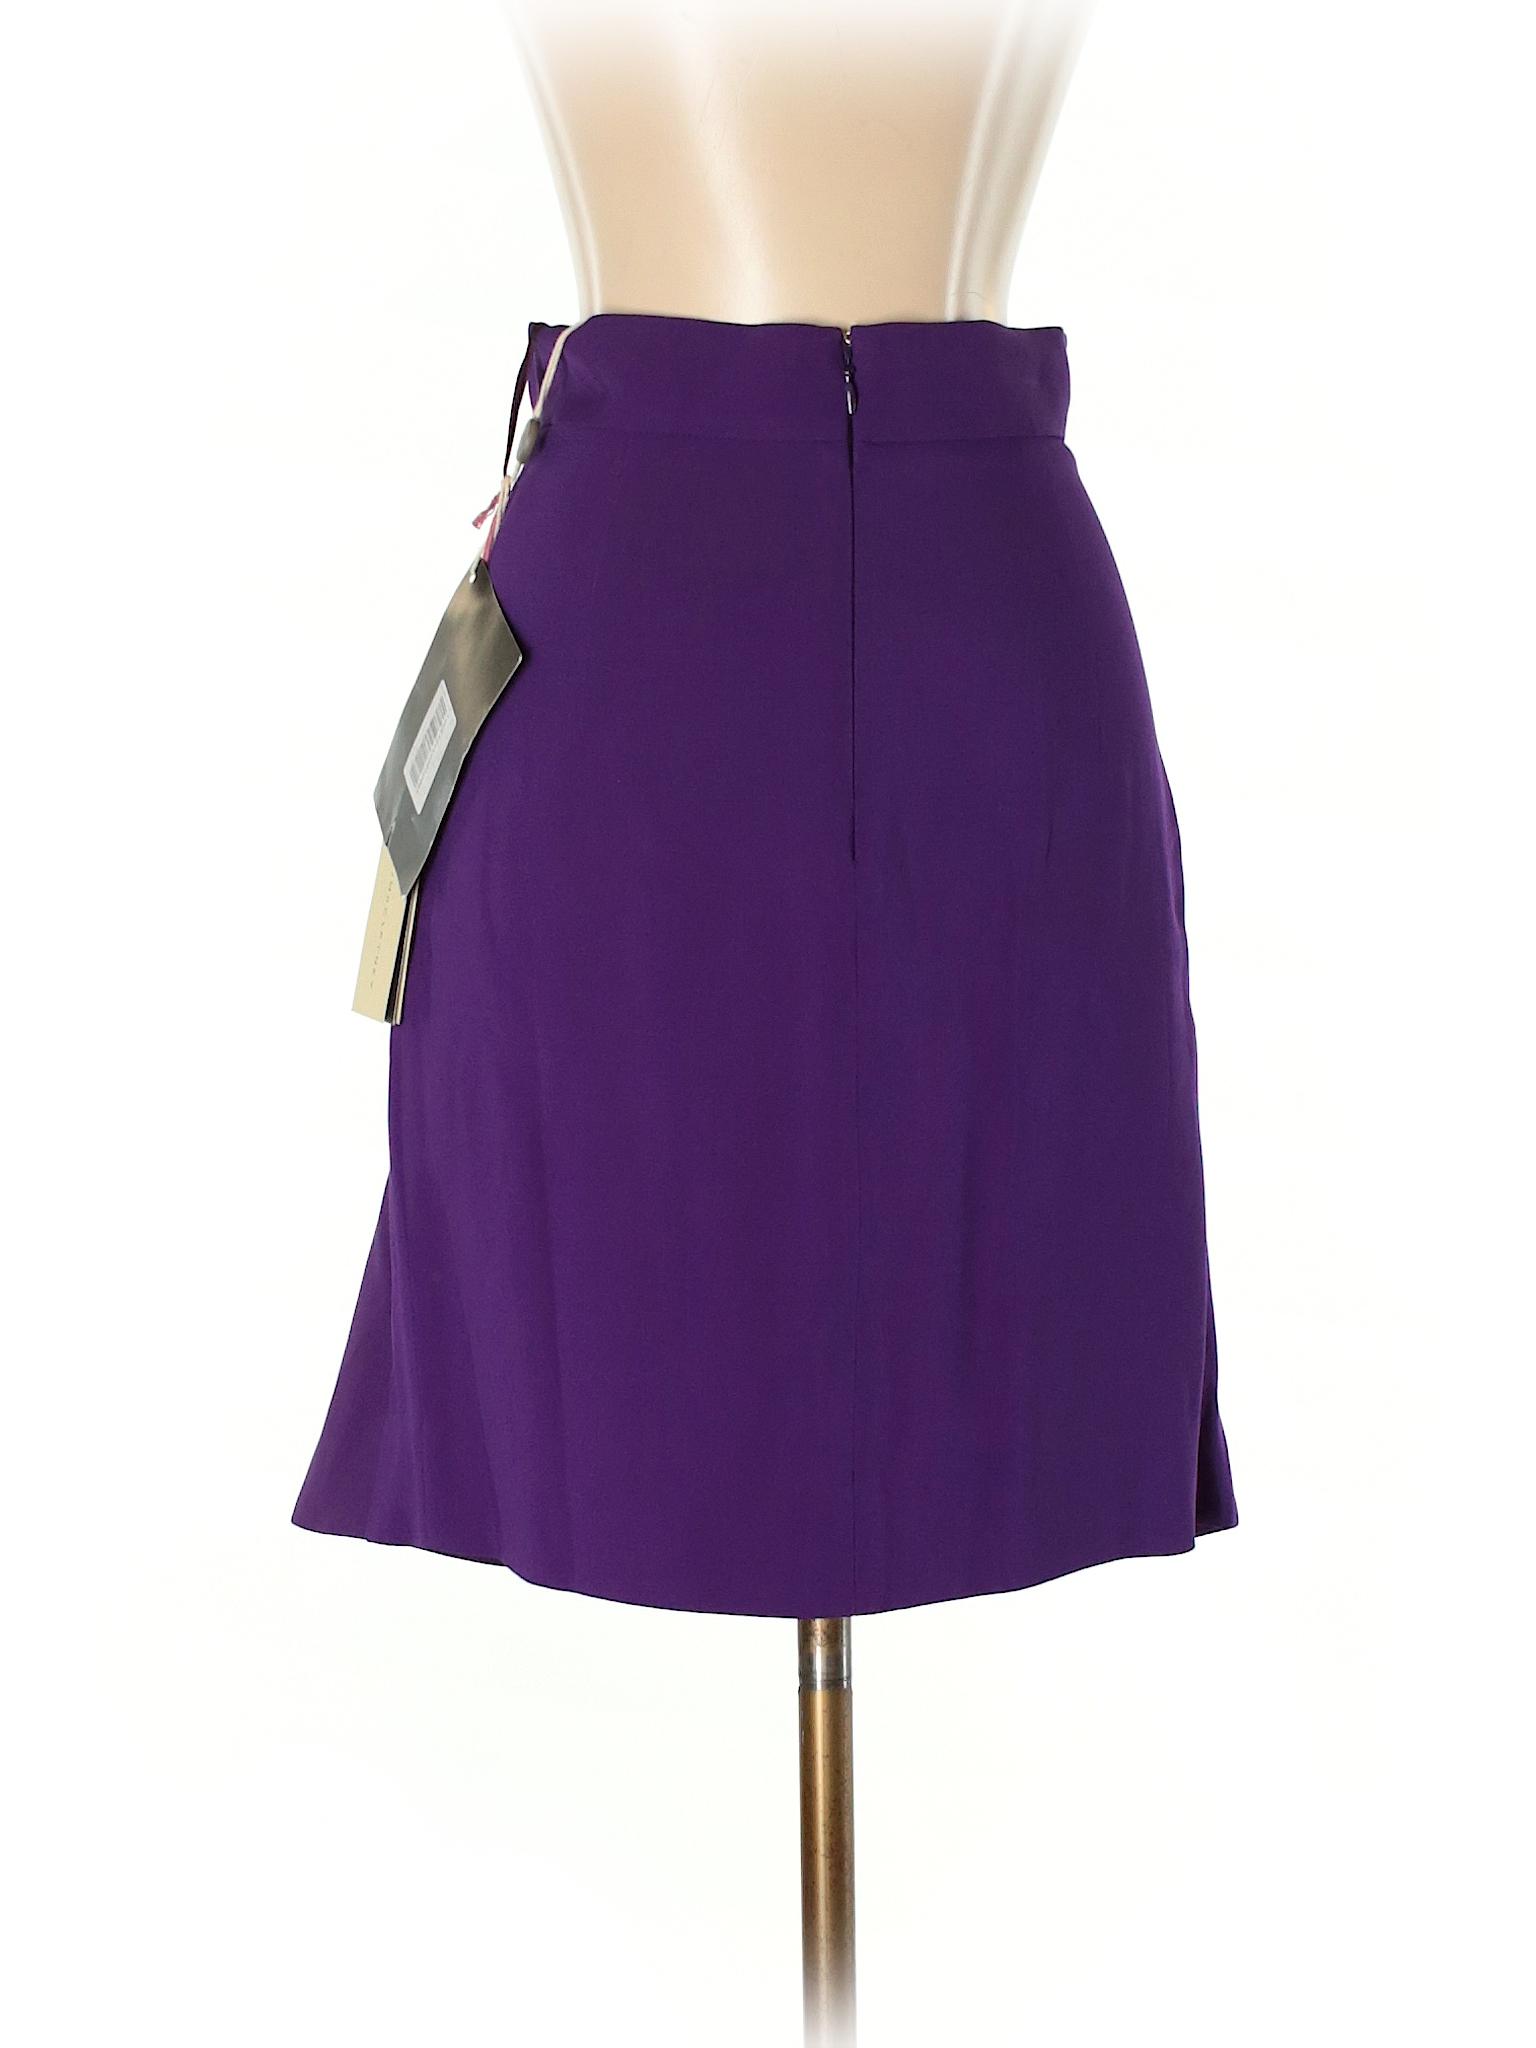 Casual Boutique Boutique Casual Skirt zRqnC